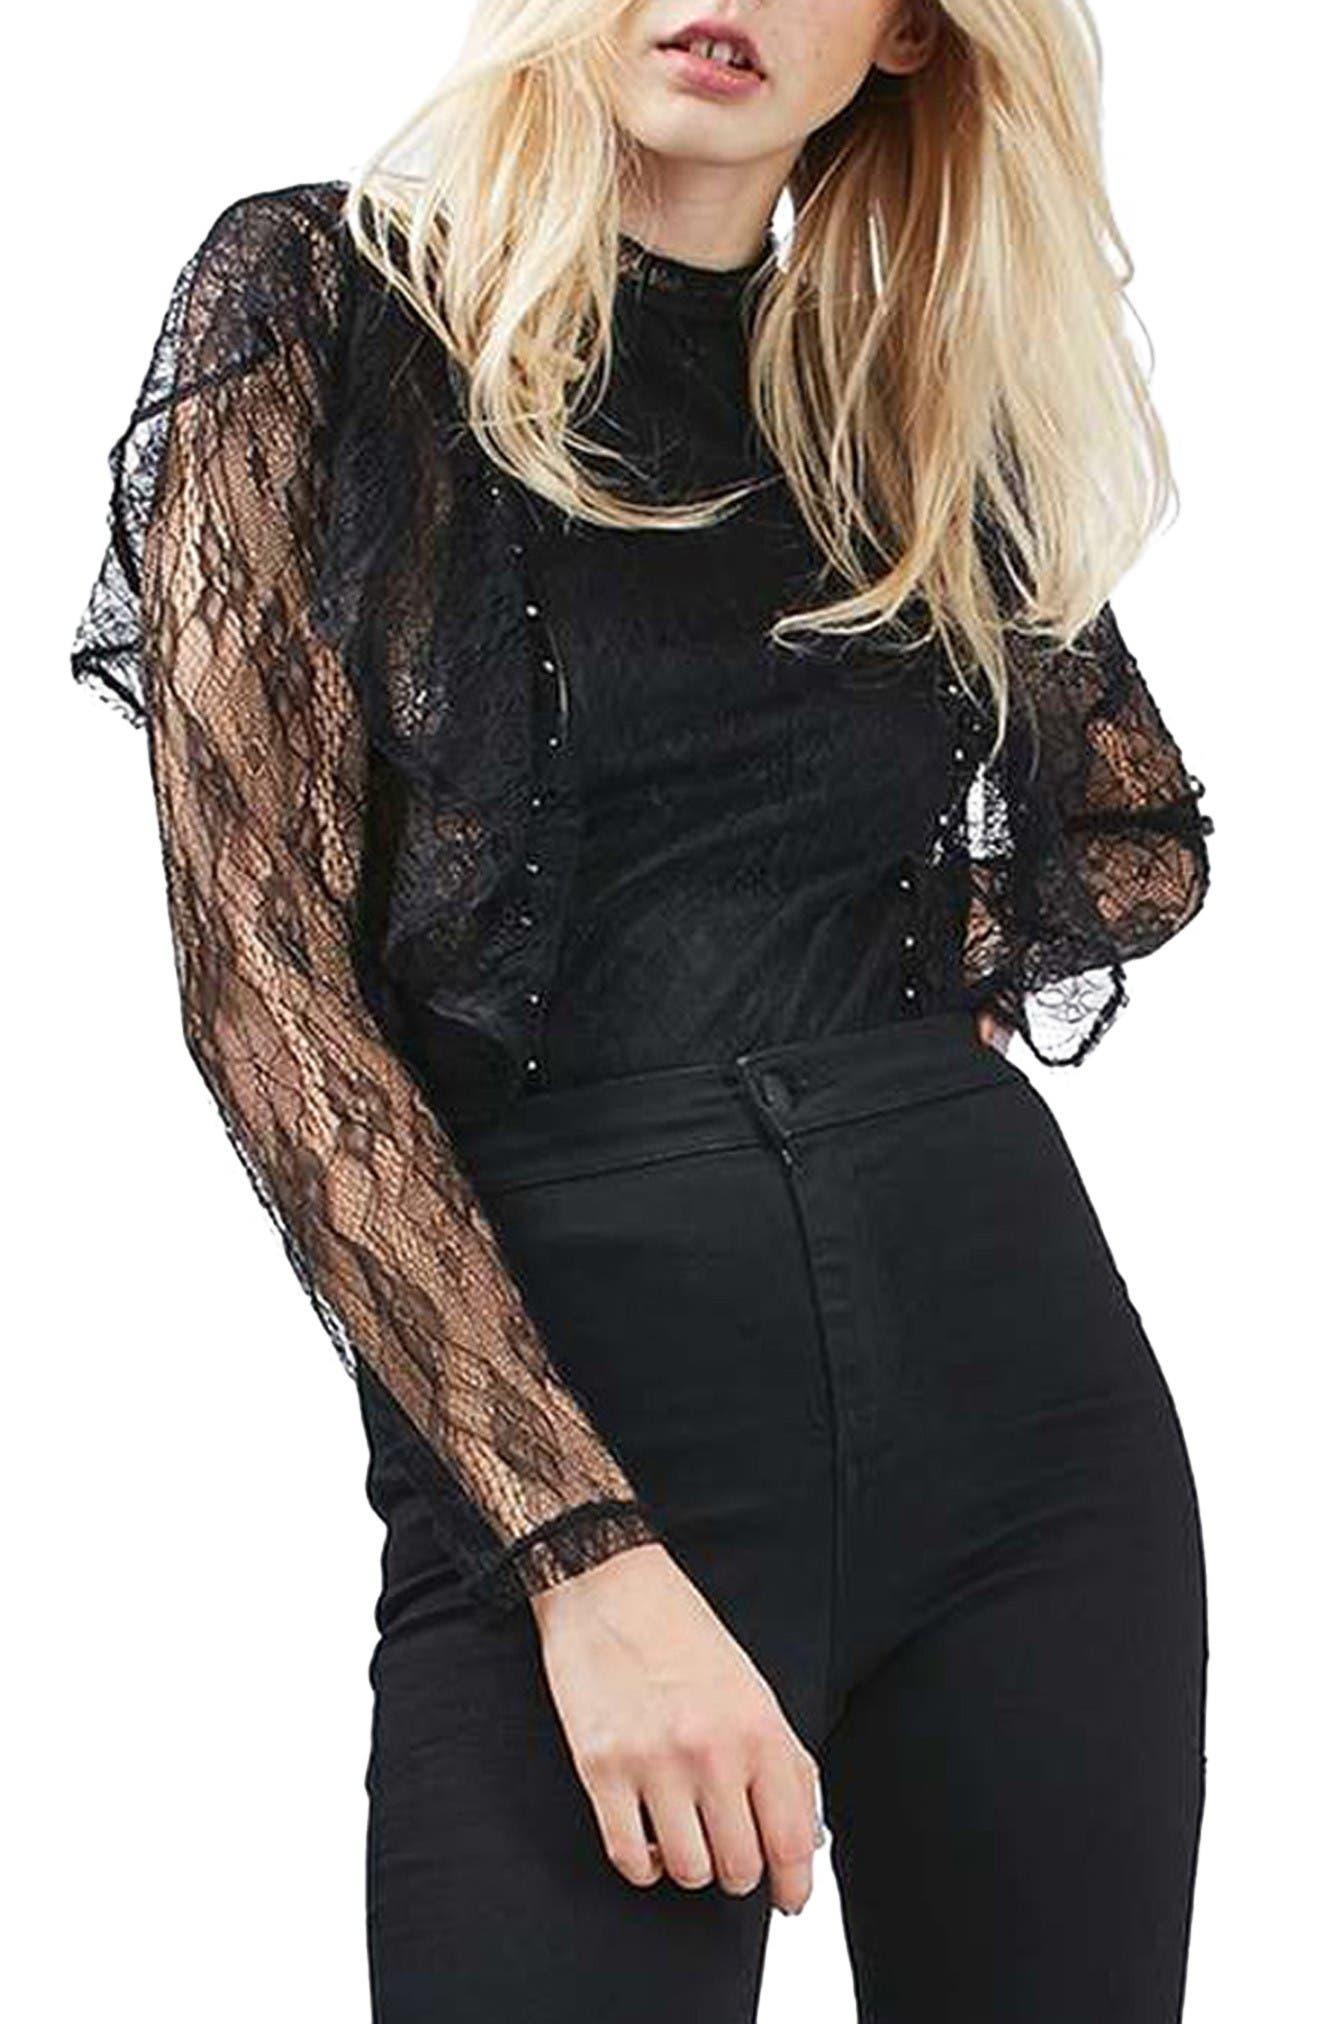 Ruffle Stud Lace Top,                         Main,                         color, Black